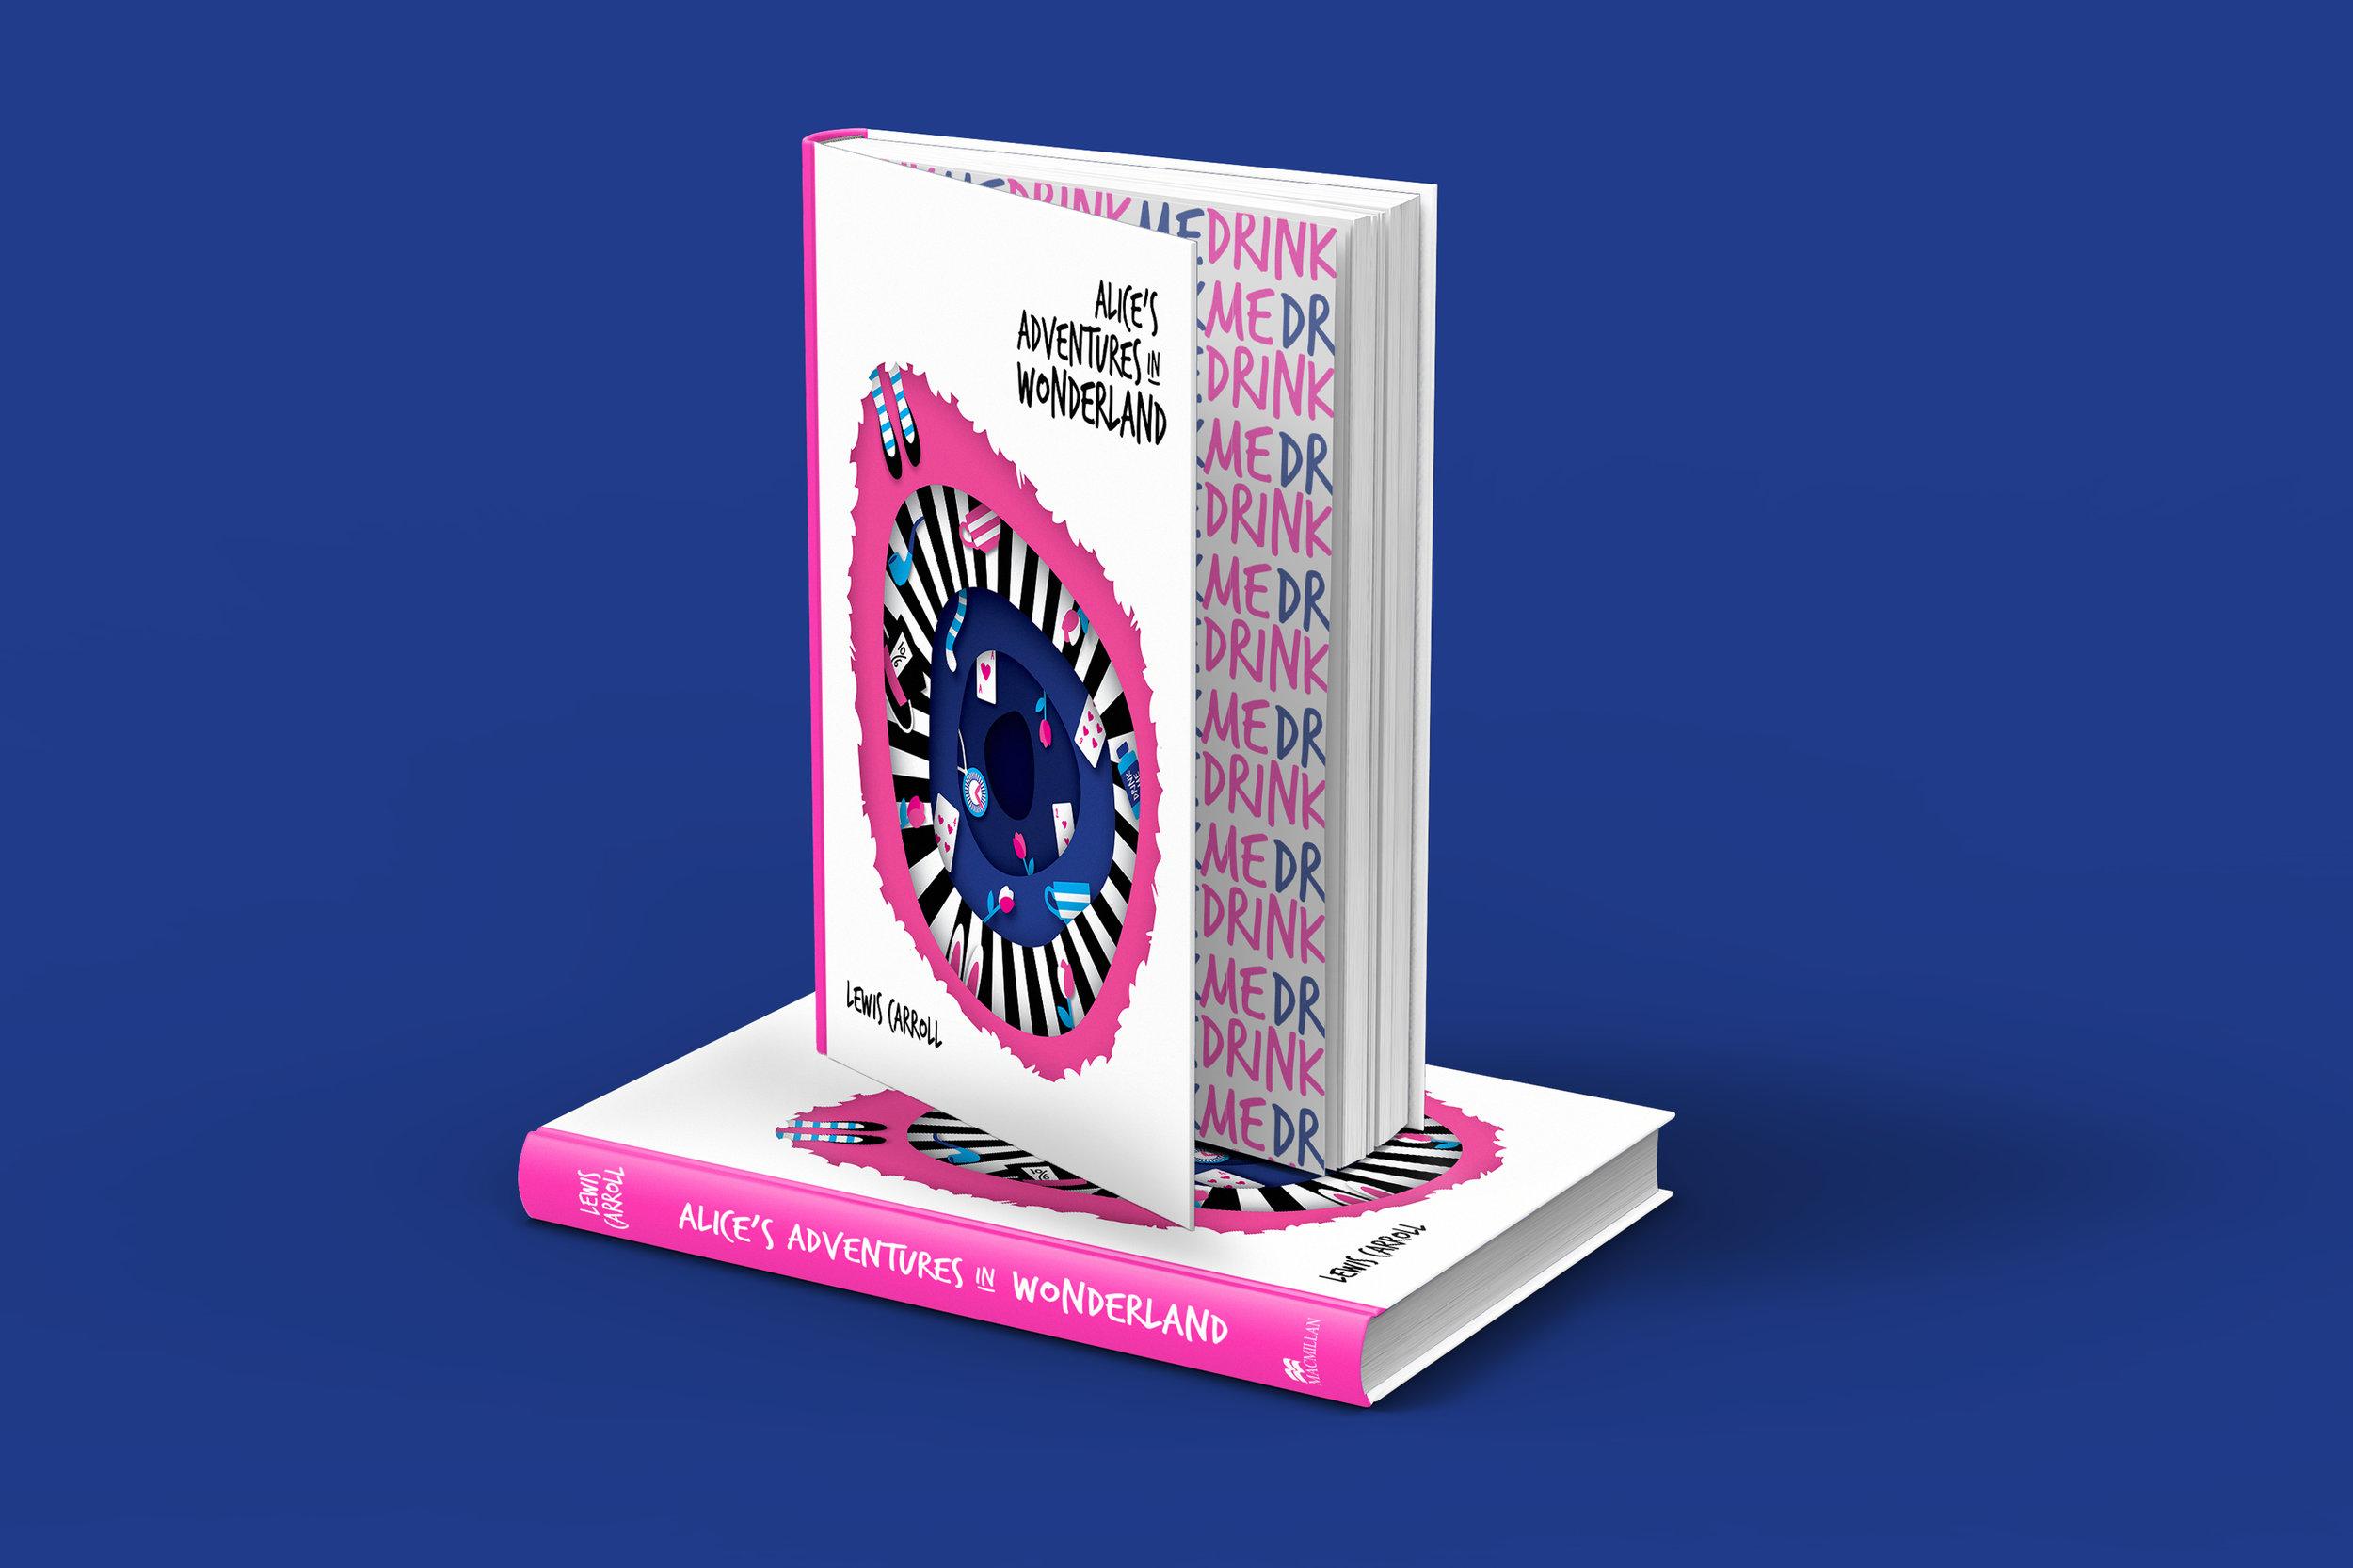 Shanti-Sparrow-alices-adventures-in-wonderland-book-cover-design